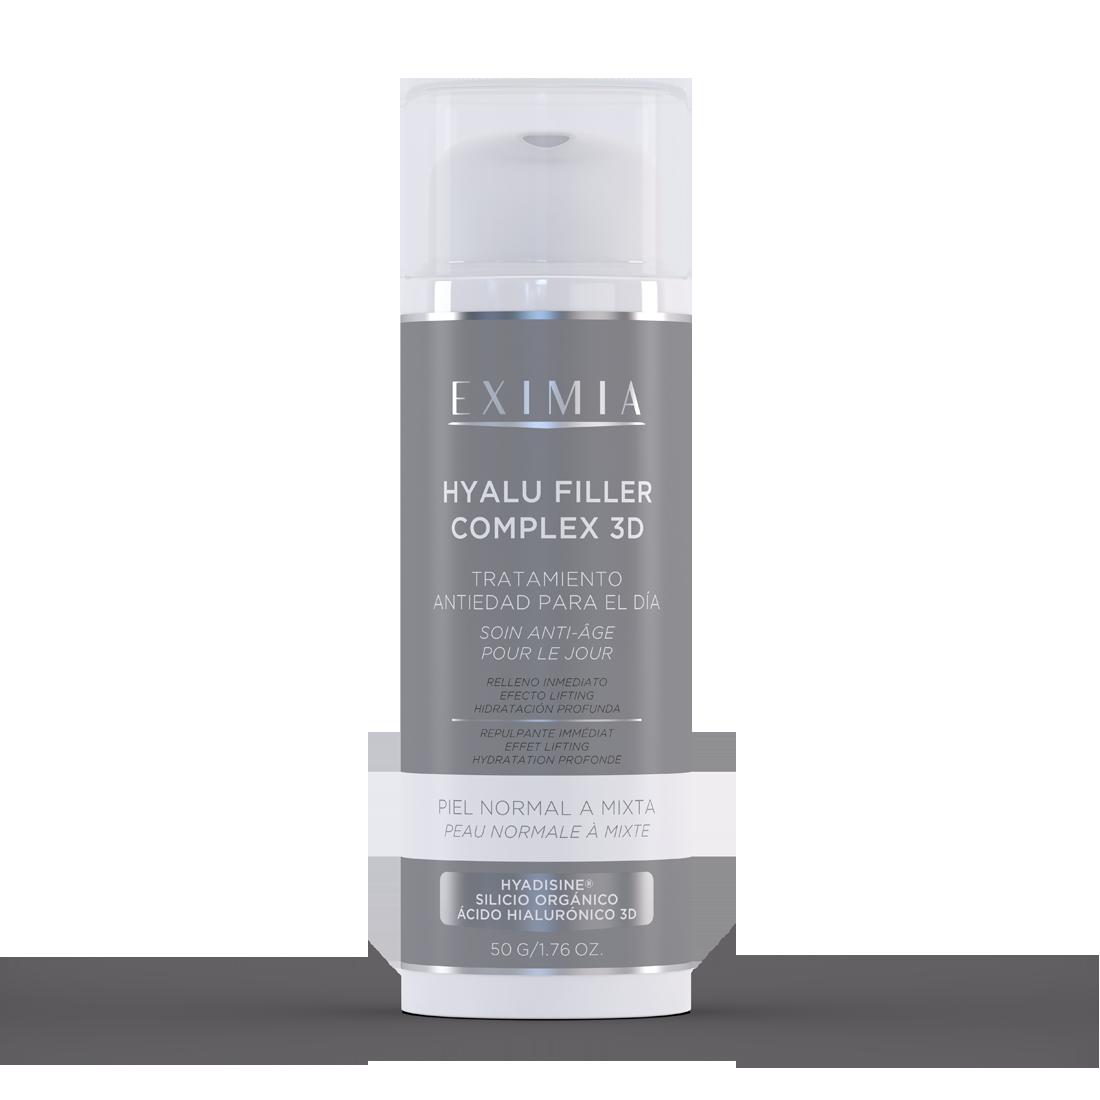 EXIMIA Hyalu Filler Complex 3d piel noramal a mixta x50g